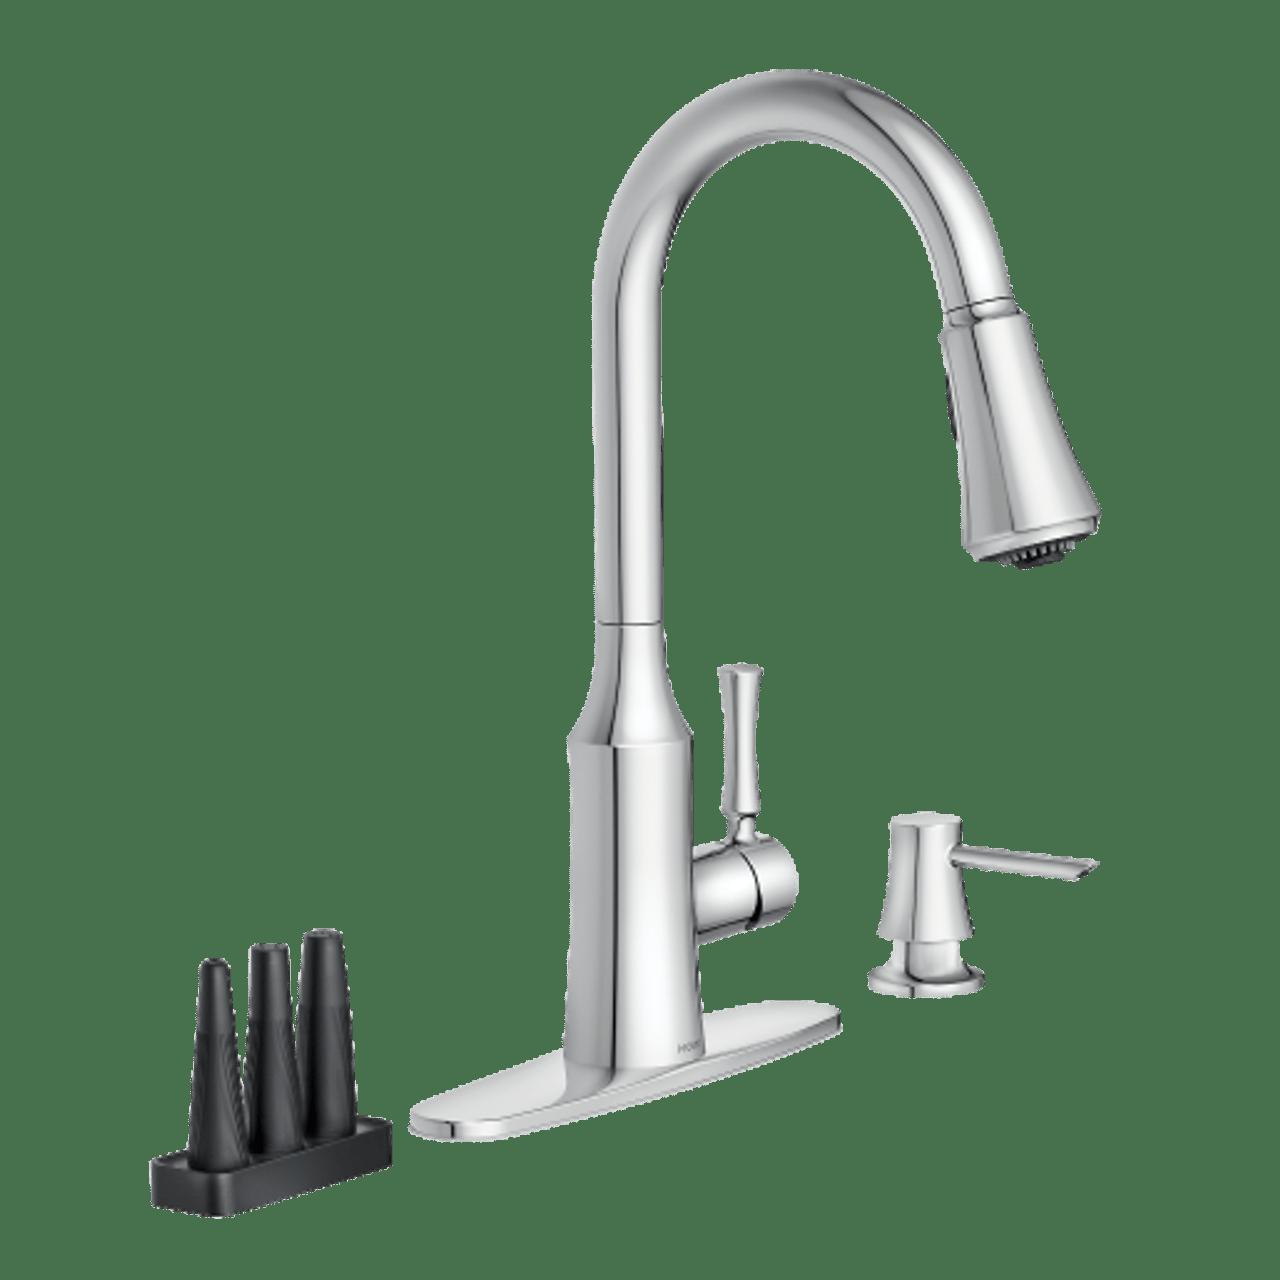 moen venango pulldown kitchen faucet with power clean attachments chrome